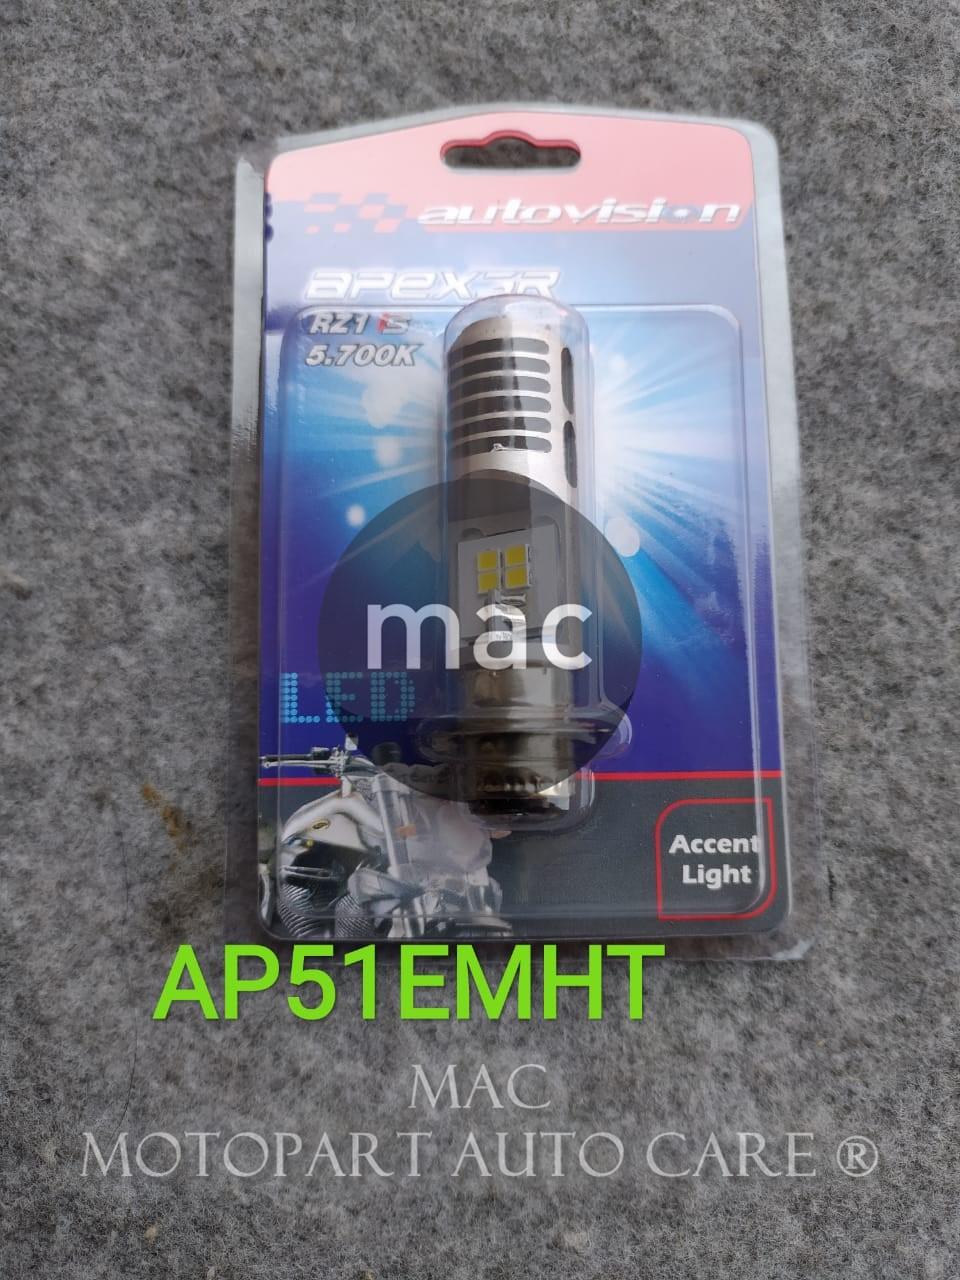 DOP LAMPU DEPAN LED BEBEK RZ1 5700K ACCENT LIGHT AUTOVISION